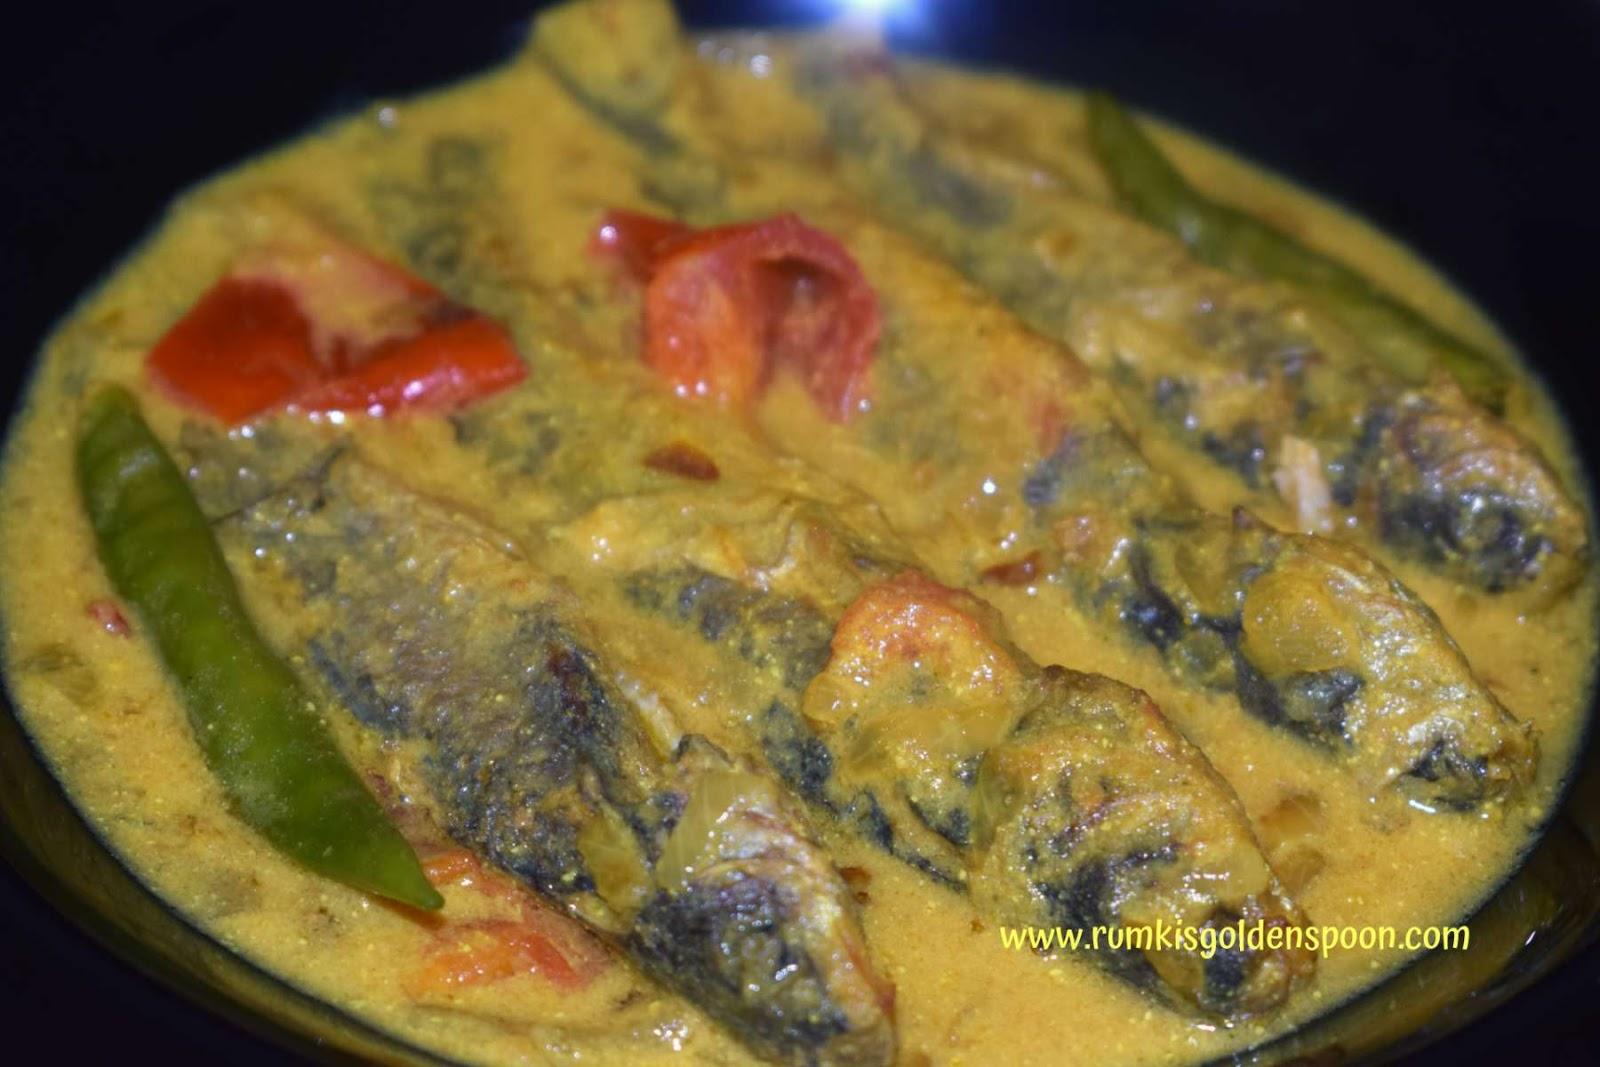 Indian Recipe, Bengali Cuisine, Shorshe Tangrar Jhal (Cat fish in Spicy Mustard Sauce), Rumki's Golden Spoon, Quick and Easy, Shorshe tangra, recipe with small fish/tangra mach/cat fish, tangra/choto macher shorshe diye jhol/rasha, choto macher/tangra macher jhaal/jhal, cat fish curry, choti machli ki gravy